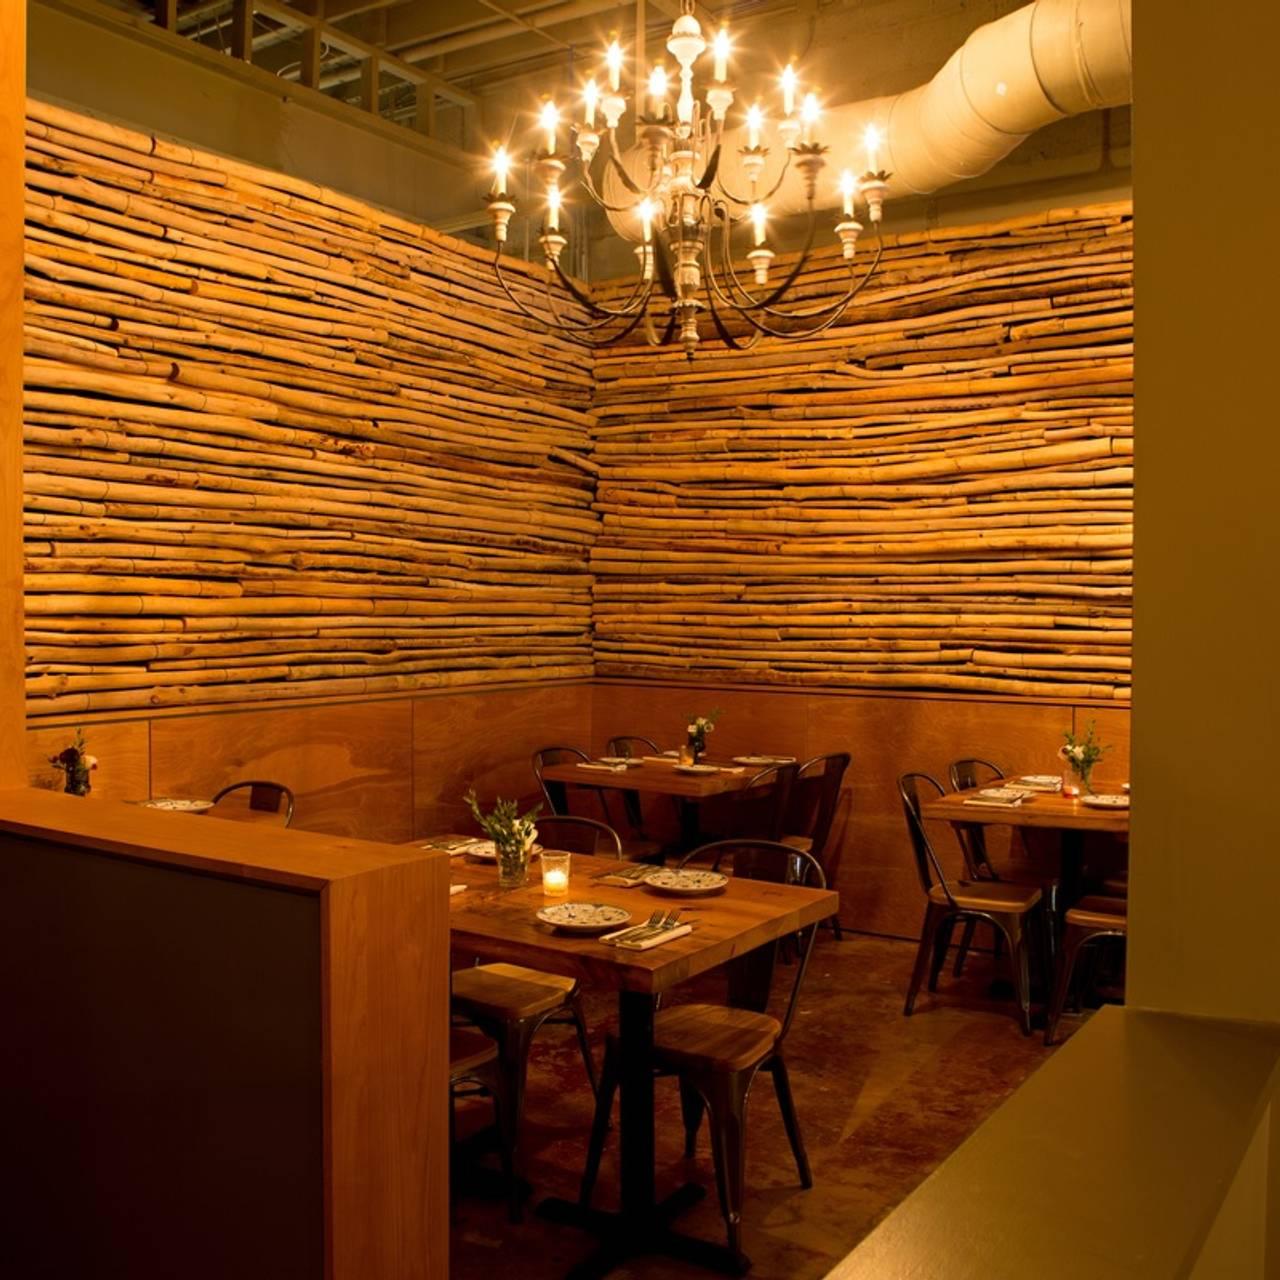 Bida Manda Restaurant and Bar